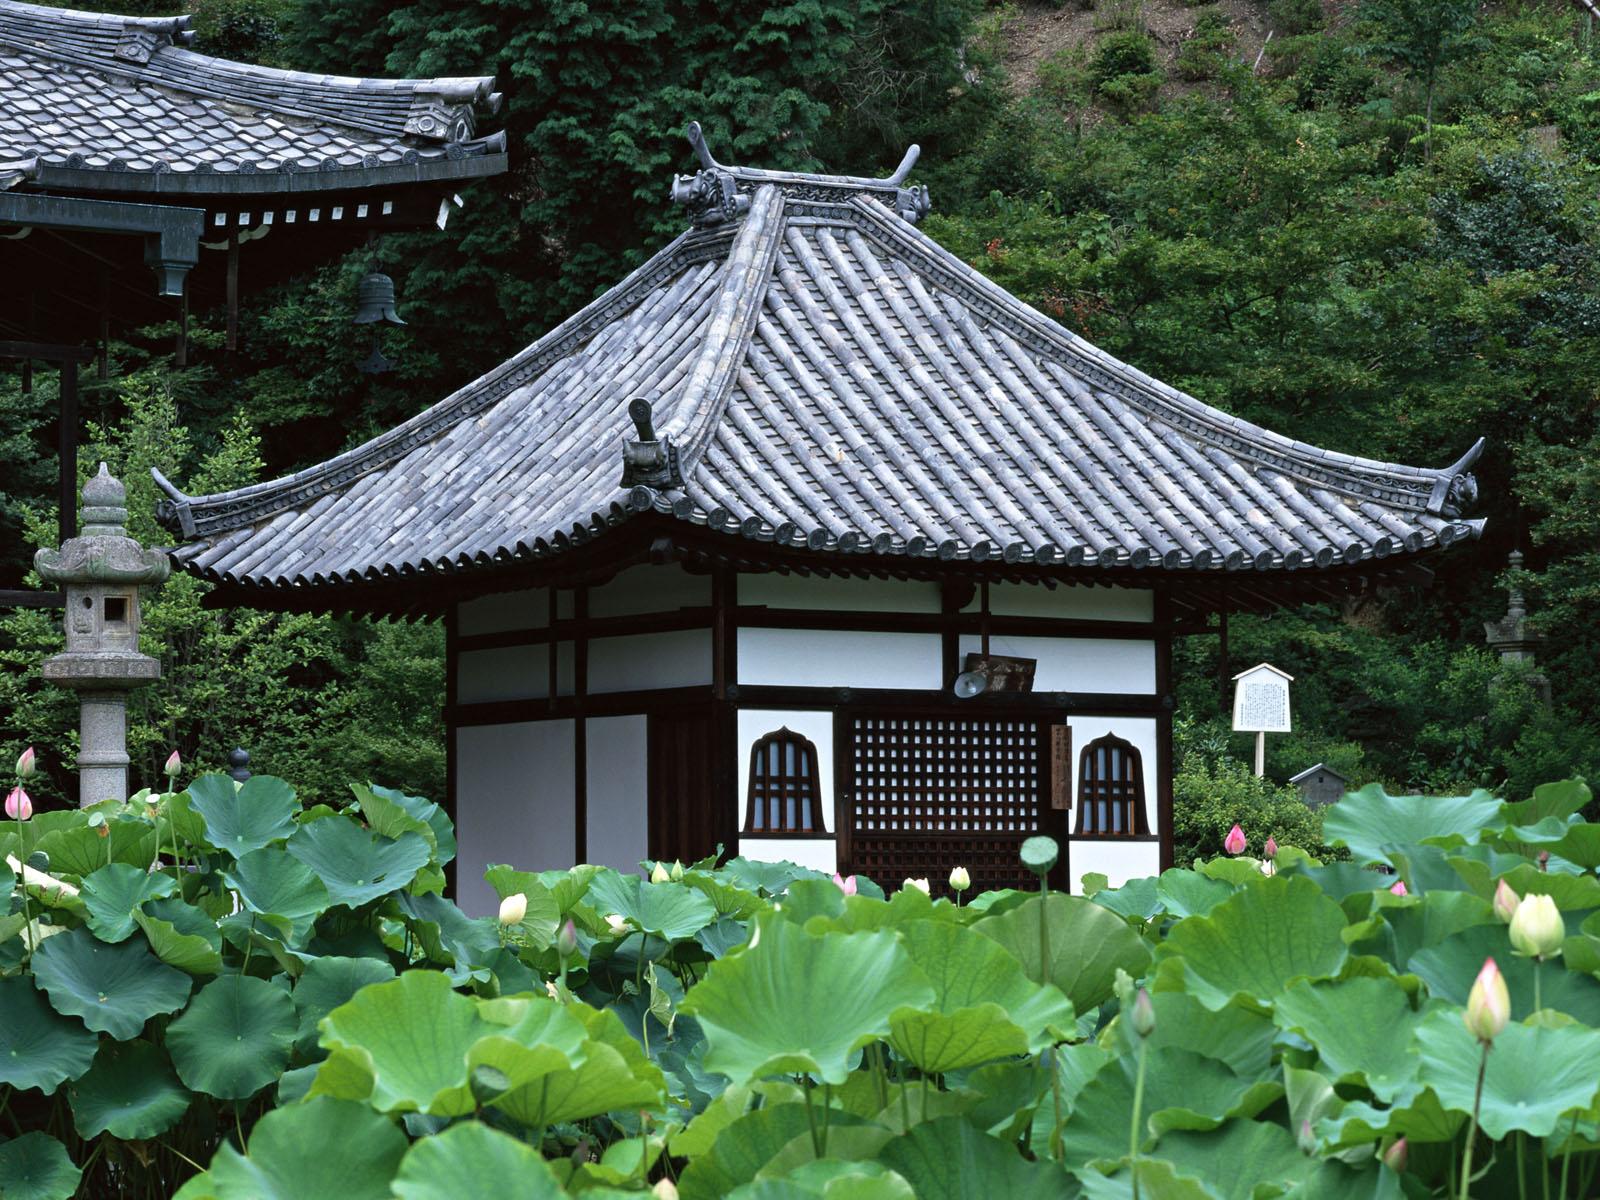 http://4.bp.blogspot.com/-QS8sE35bI6k/Tbp9fcyrlXI/AAAAAAAAAac/rejA3hdMVP8/s1600/Kyoto073.jpg